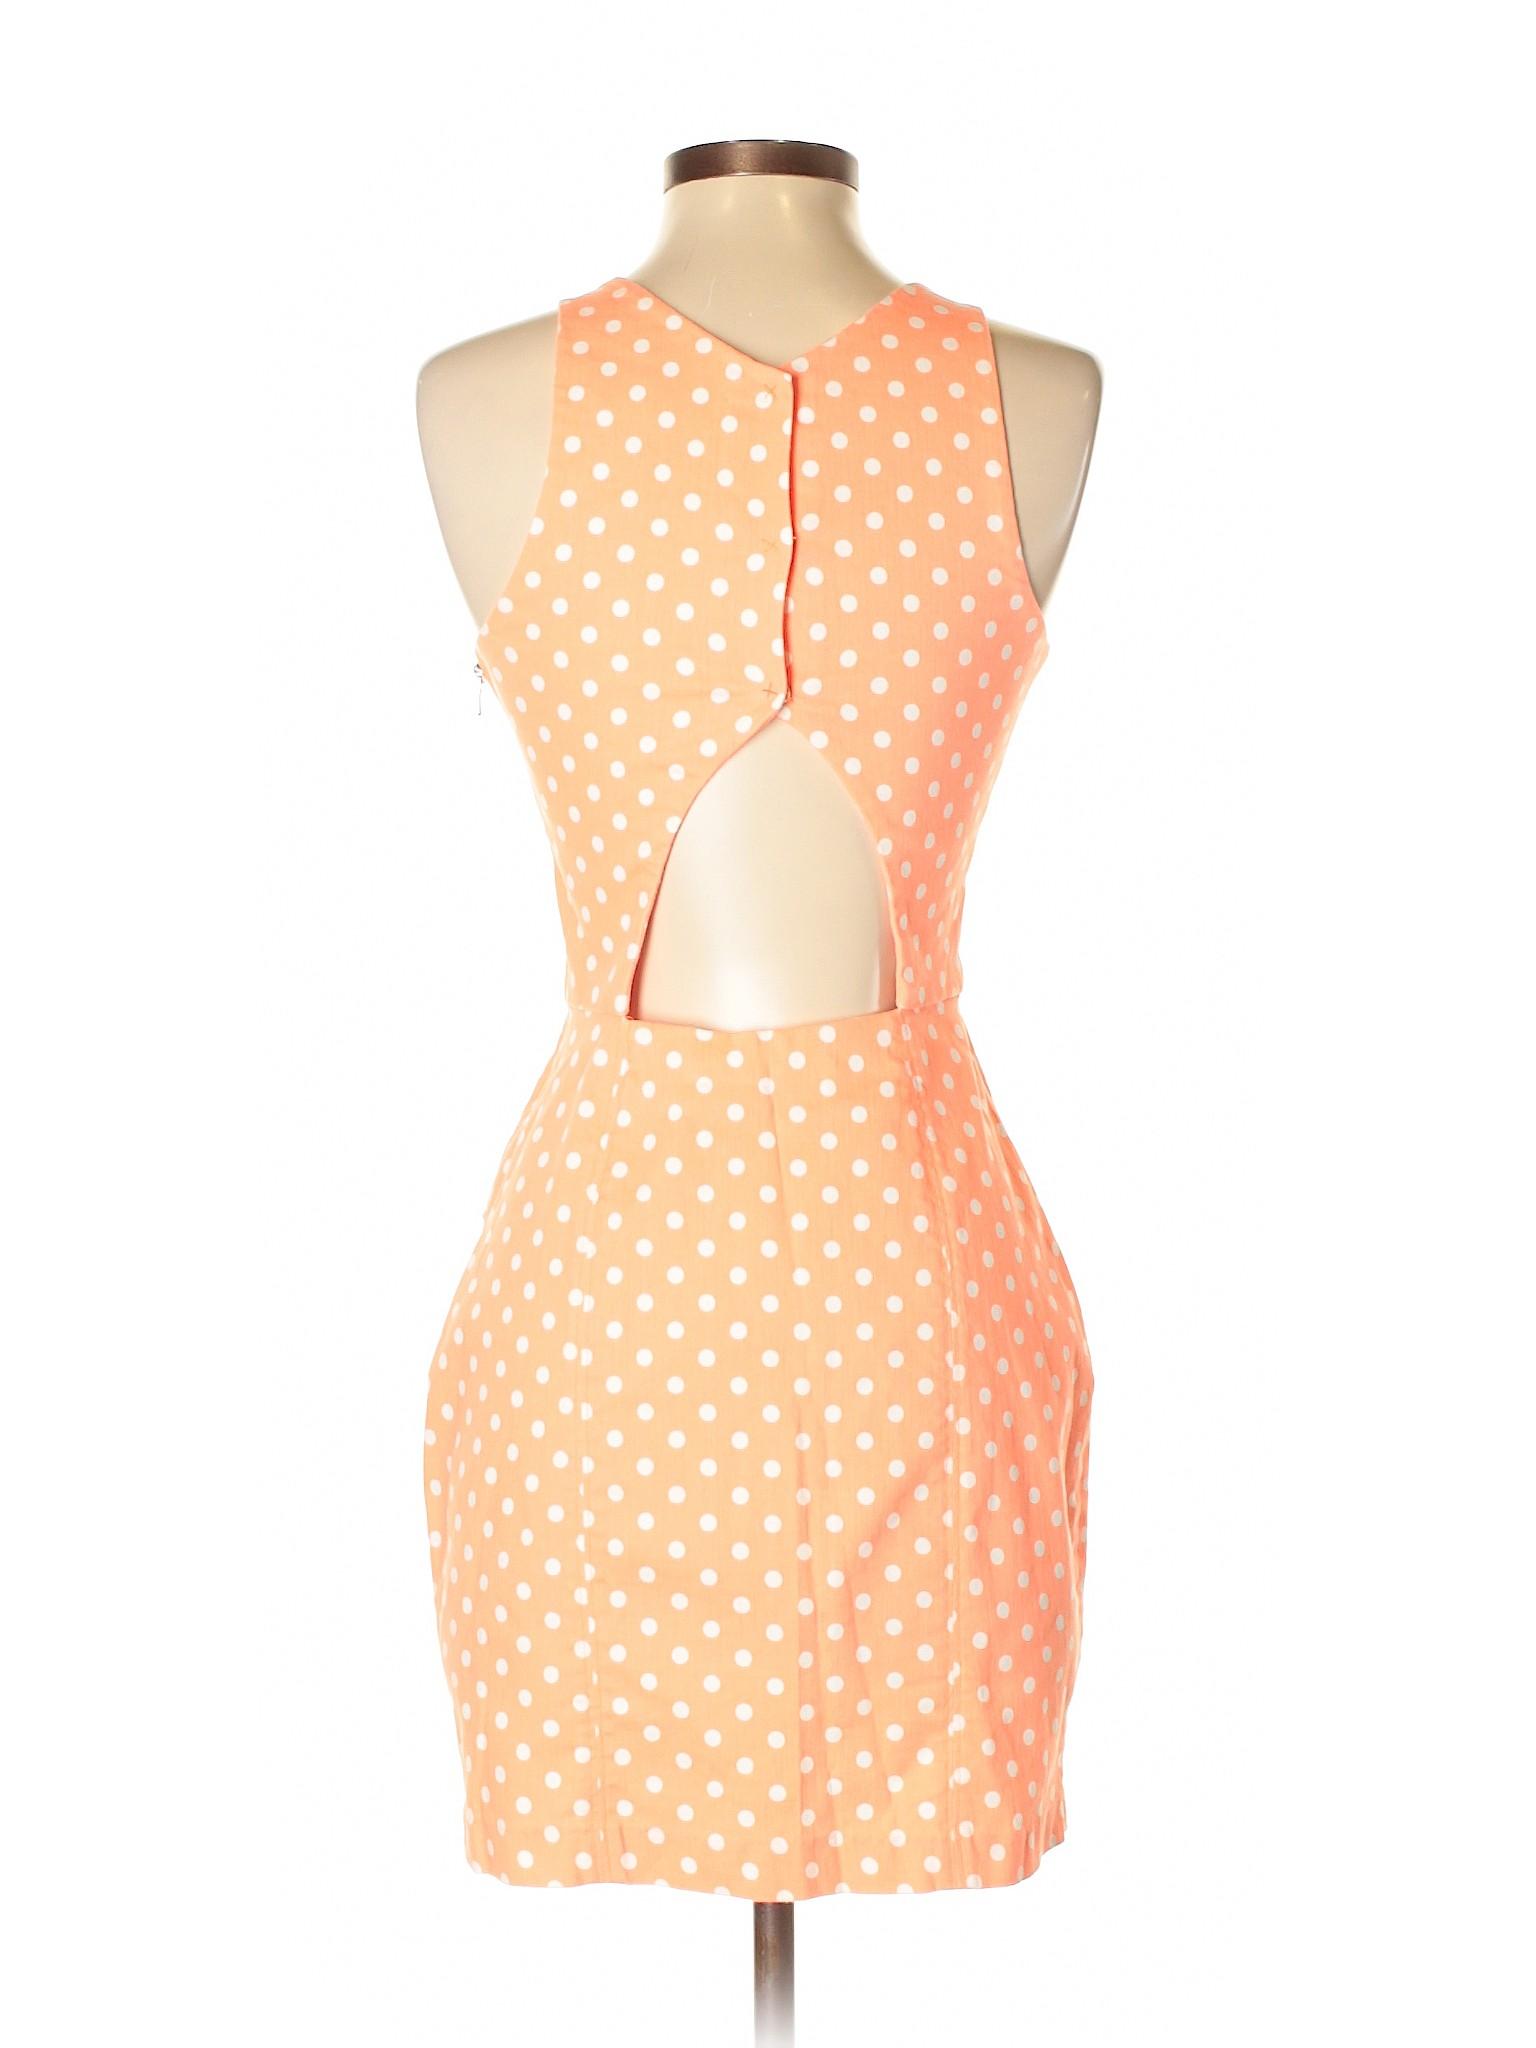 DV Casual Boutique Boutique winter DV Casual Dress winter Dress 7FY0n